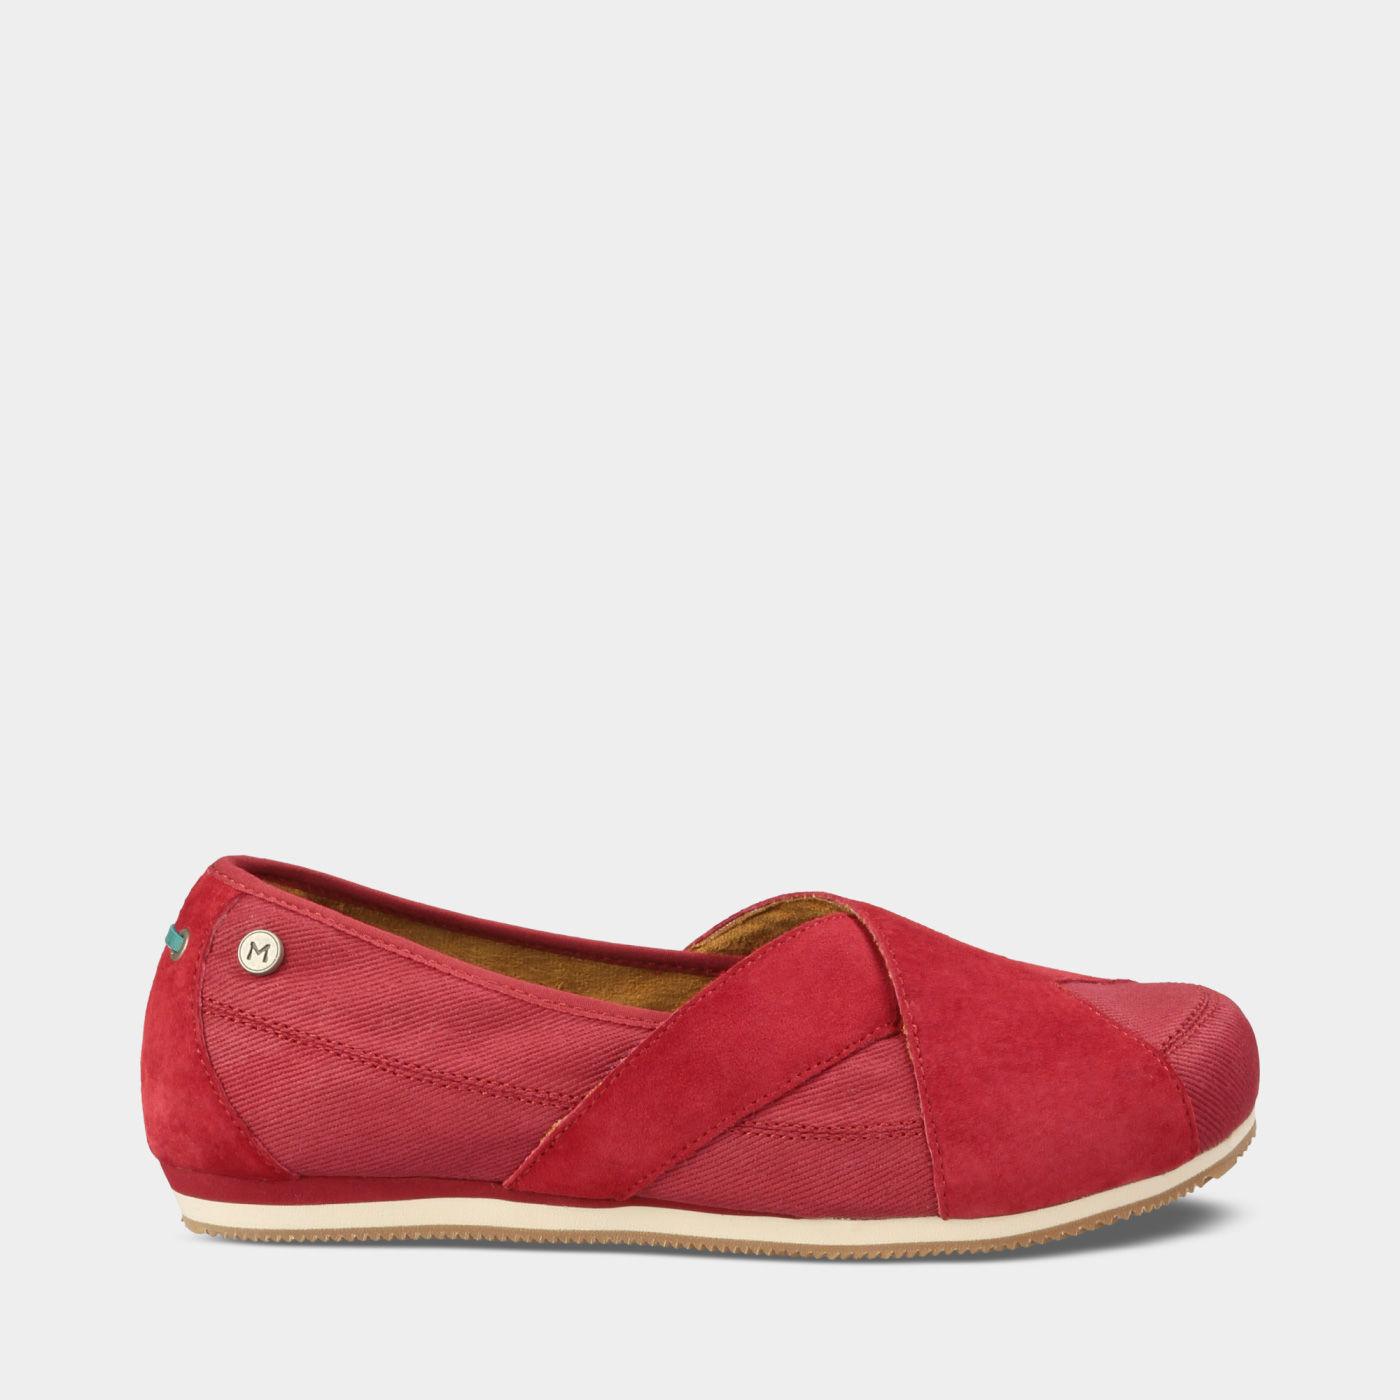 mozo 3740 10 s sport suede canvas shoes slip